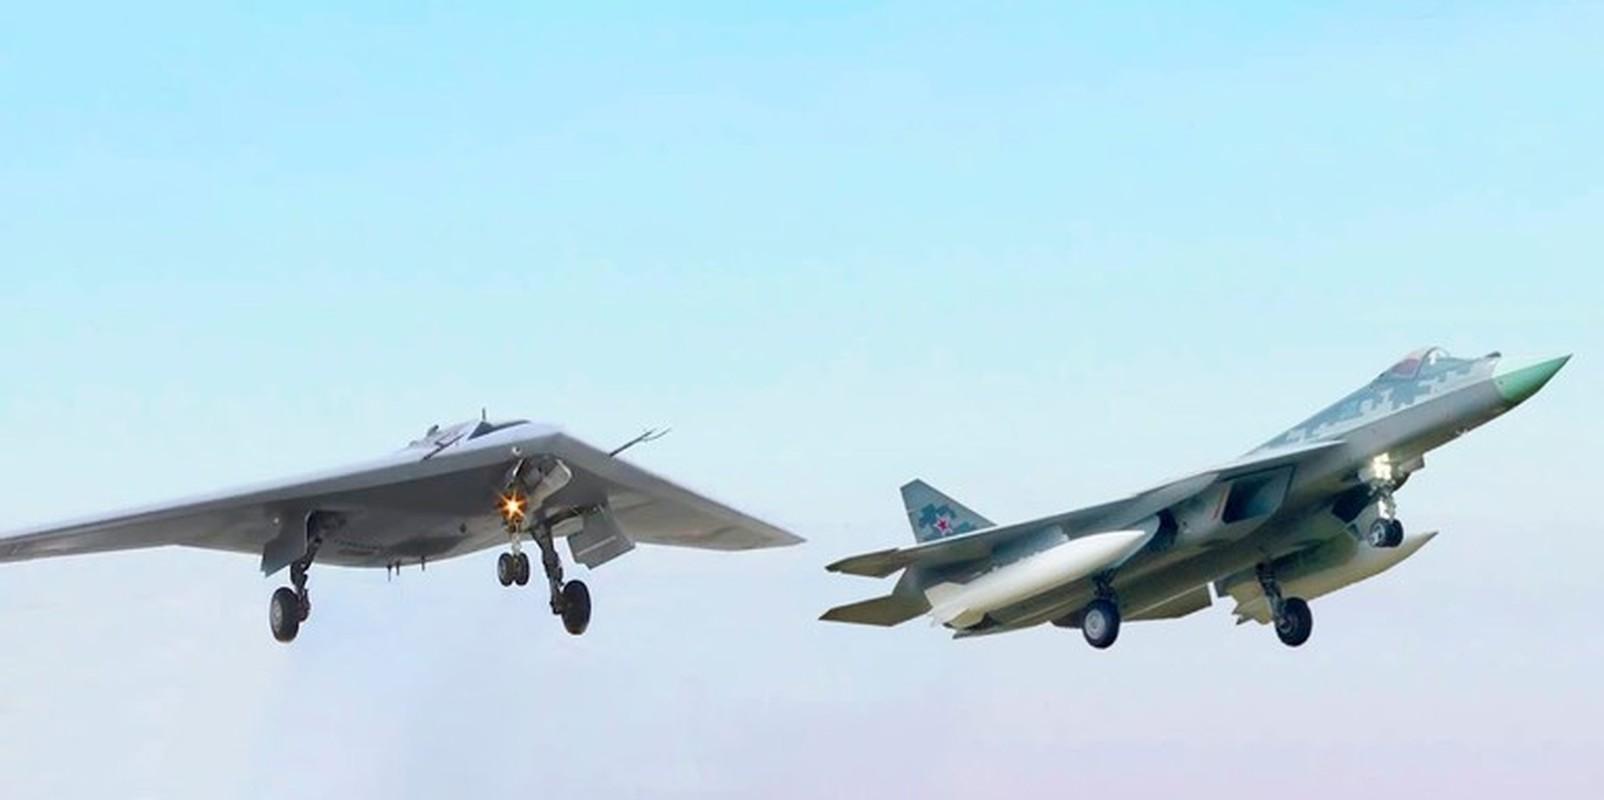 May bay khong nguoi lai cua Ukraine co thang duoc UAV cua Nga?-Hinh-5